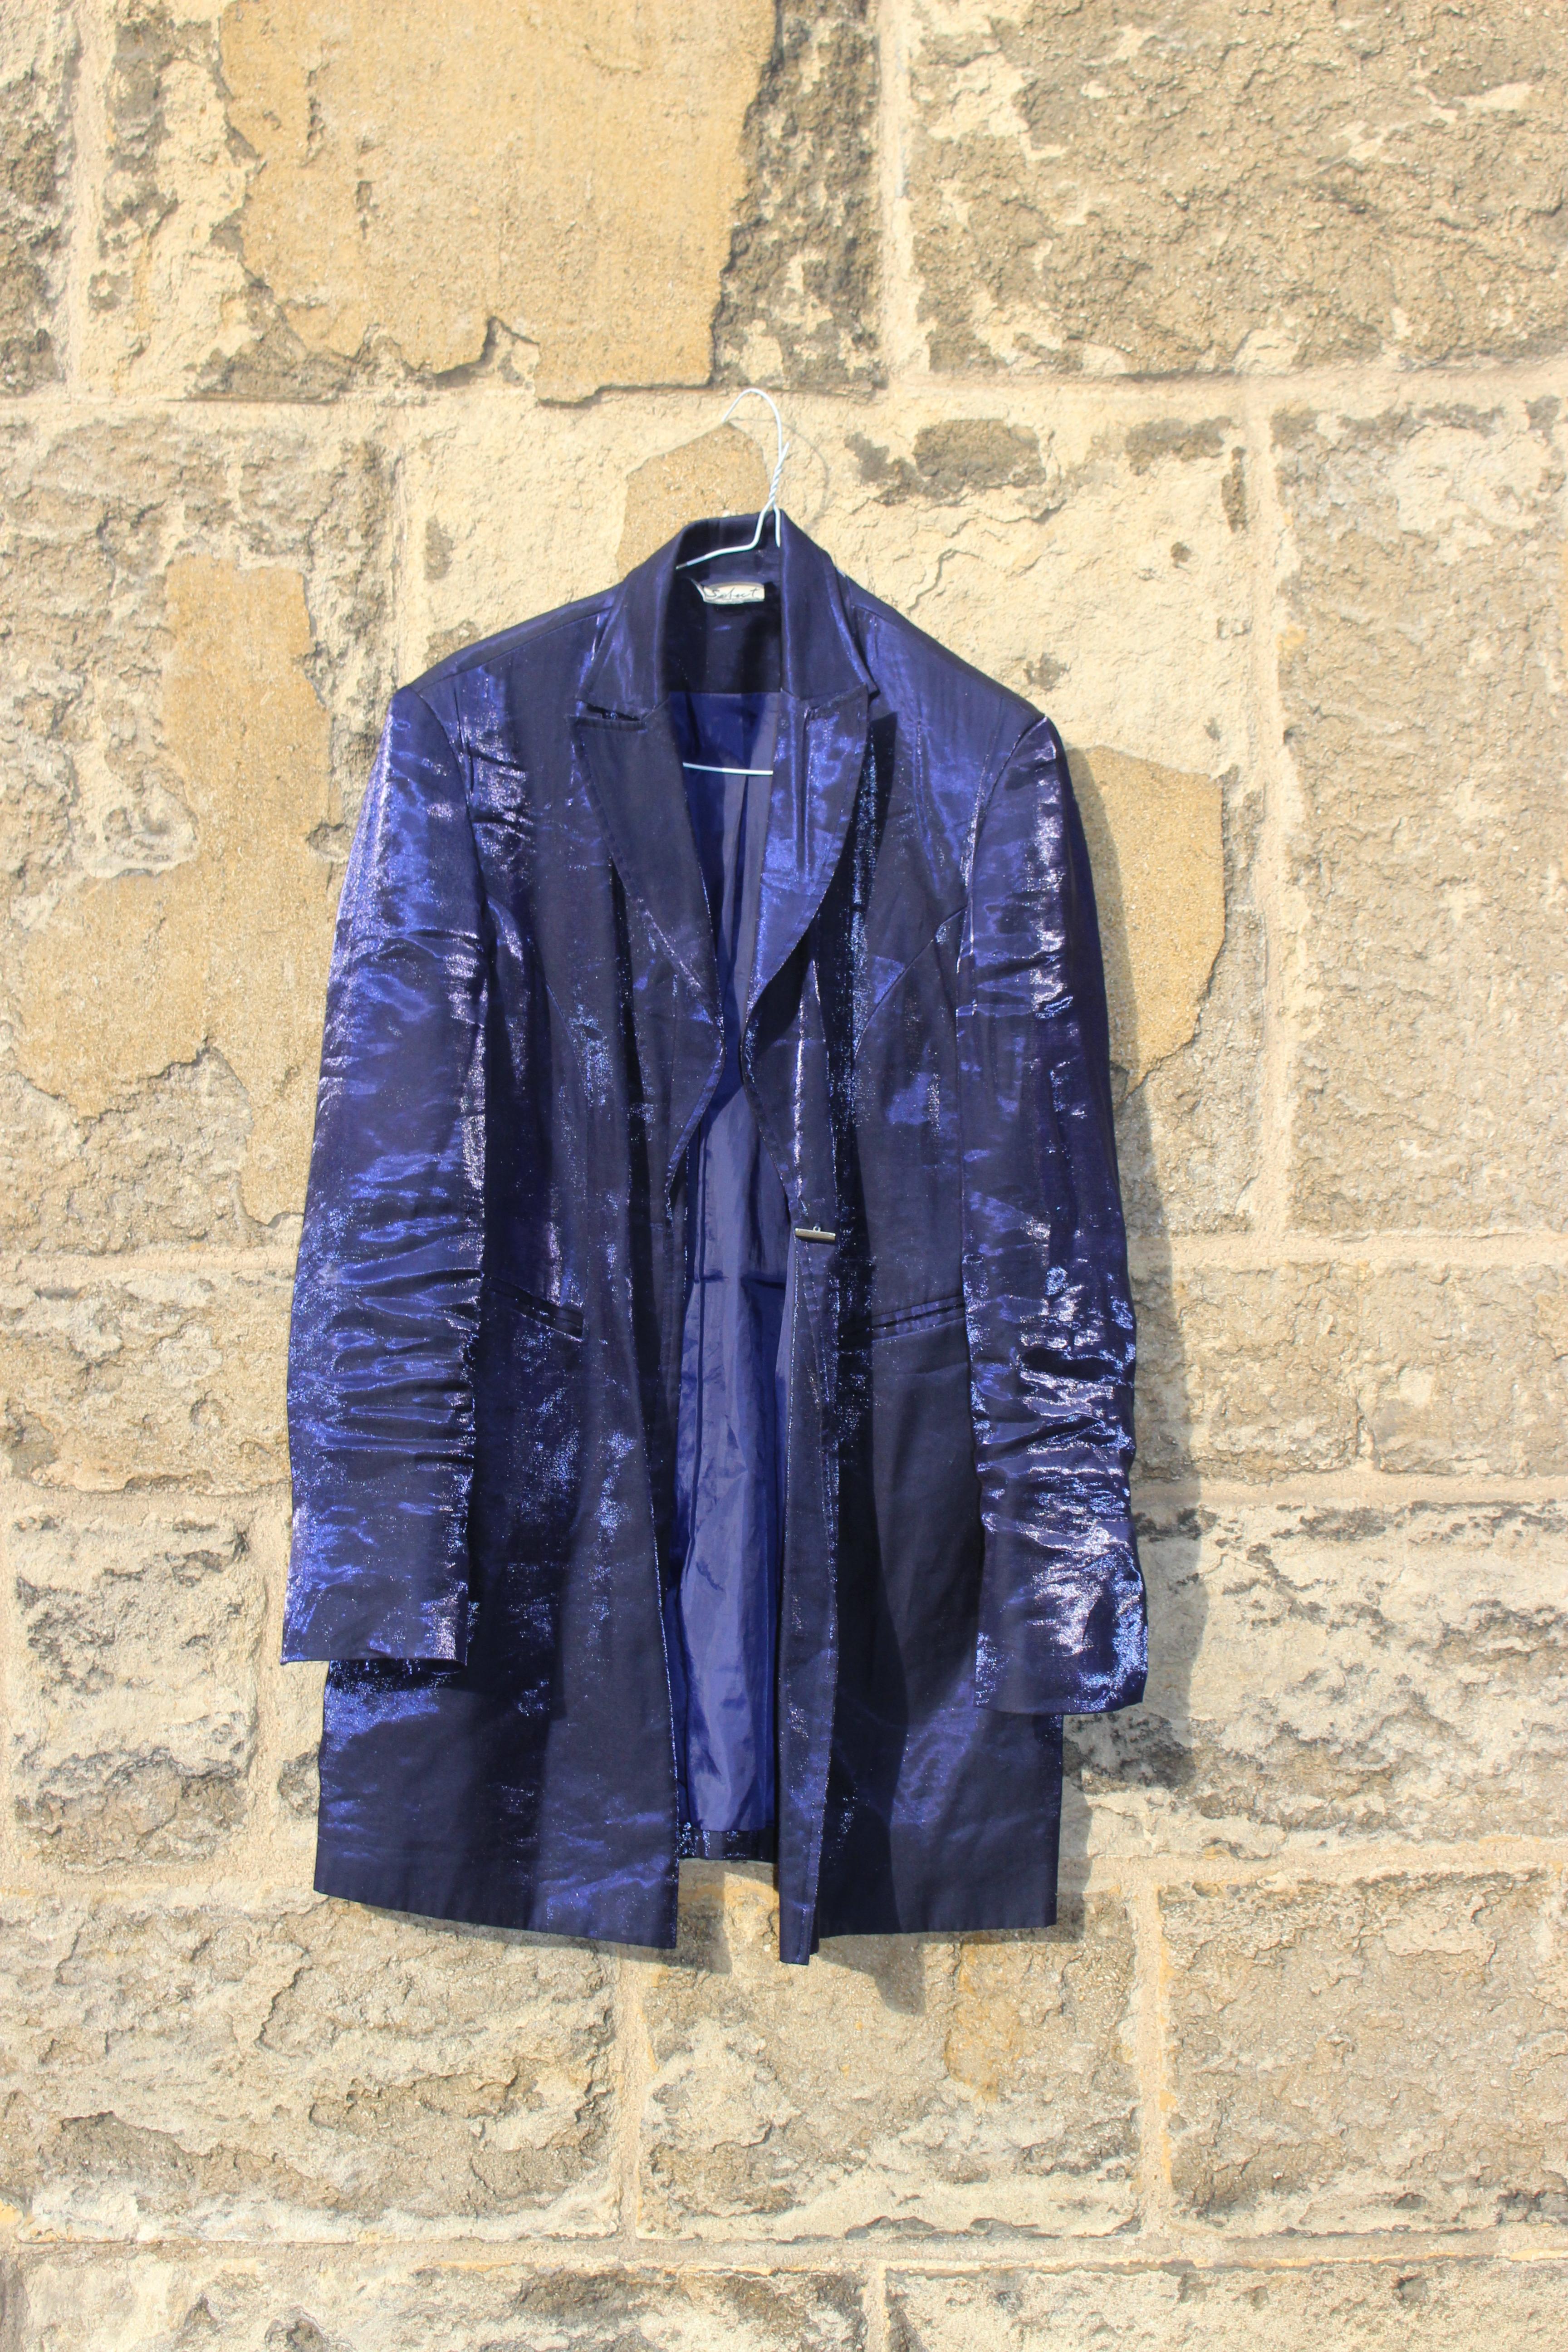 Select purple satin jacket, from Unicorn, 5 Ship Street, Oxford